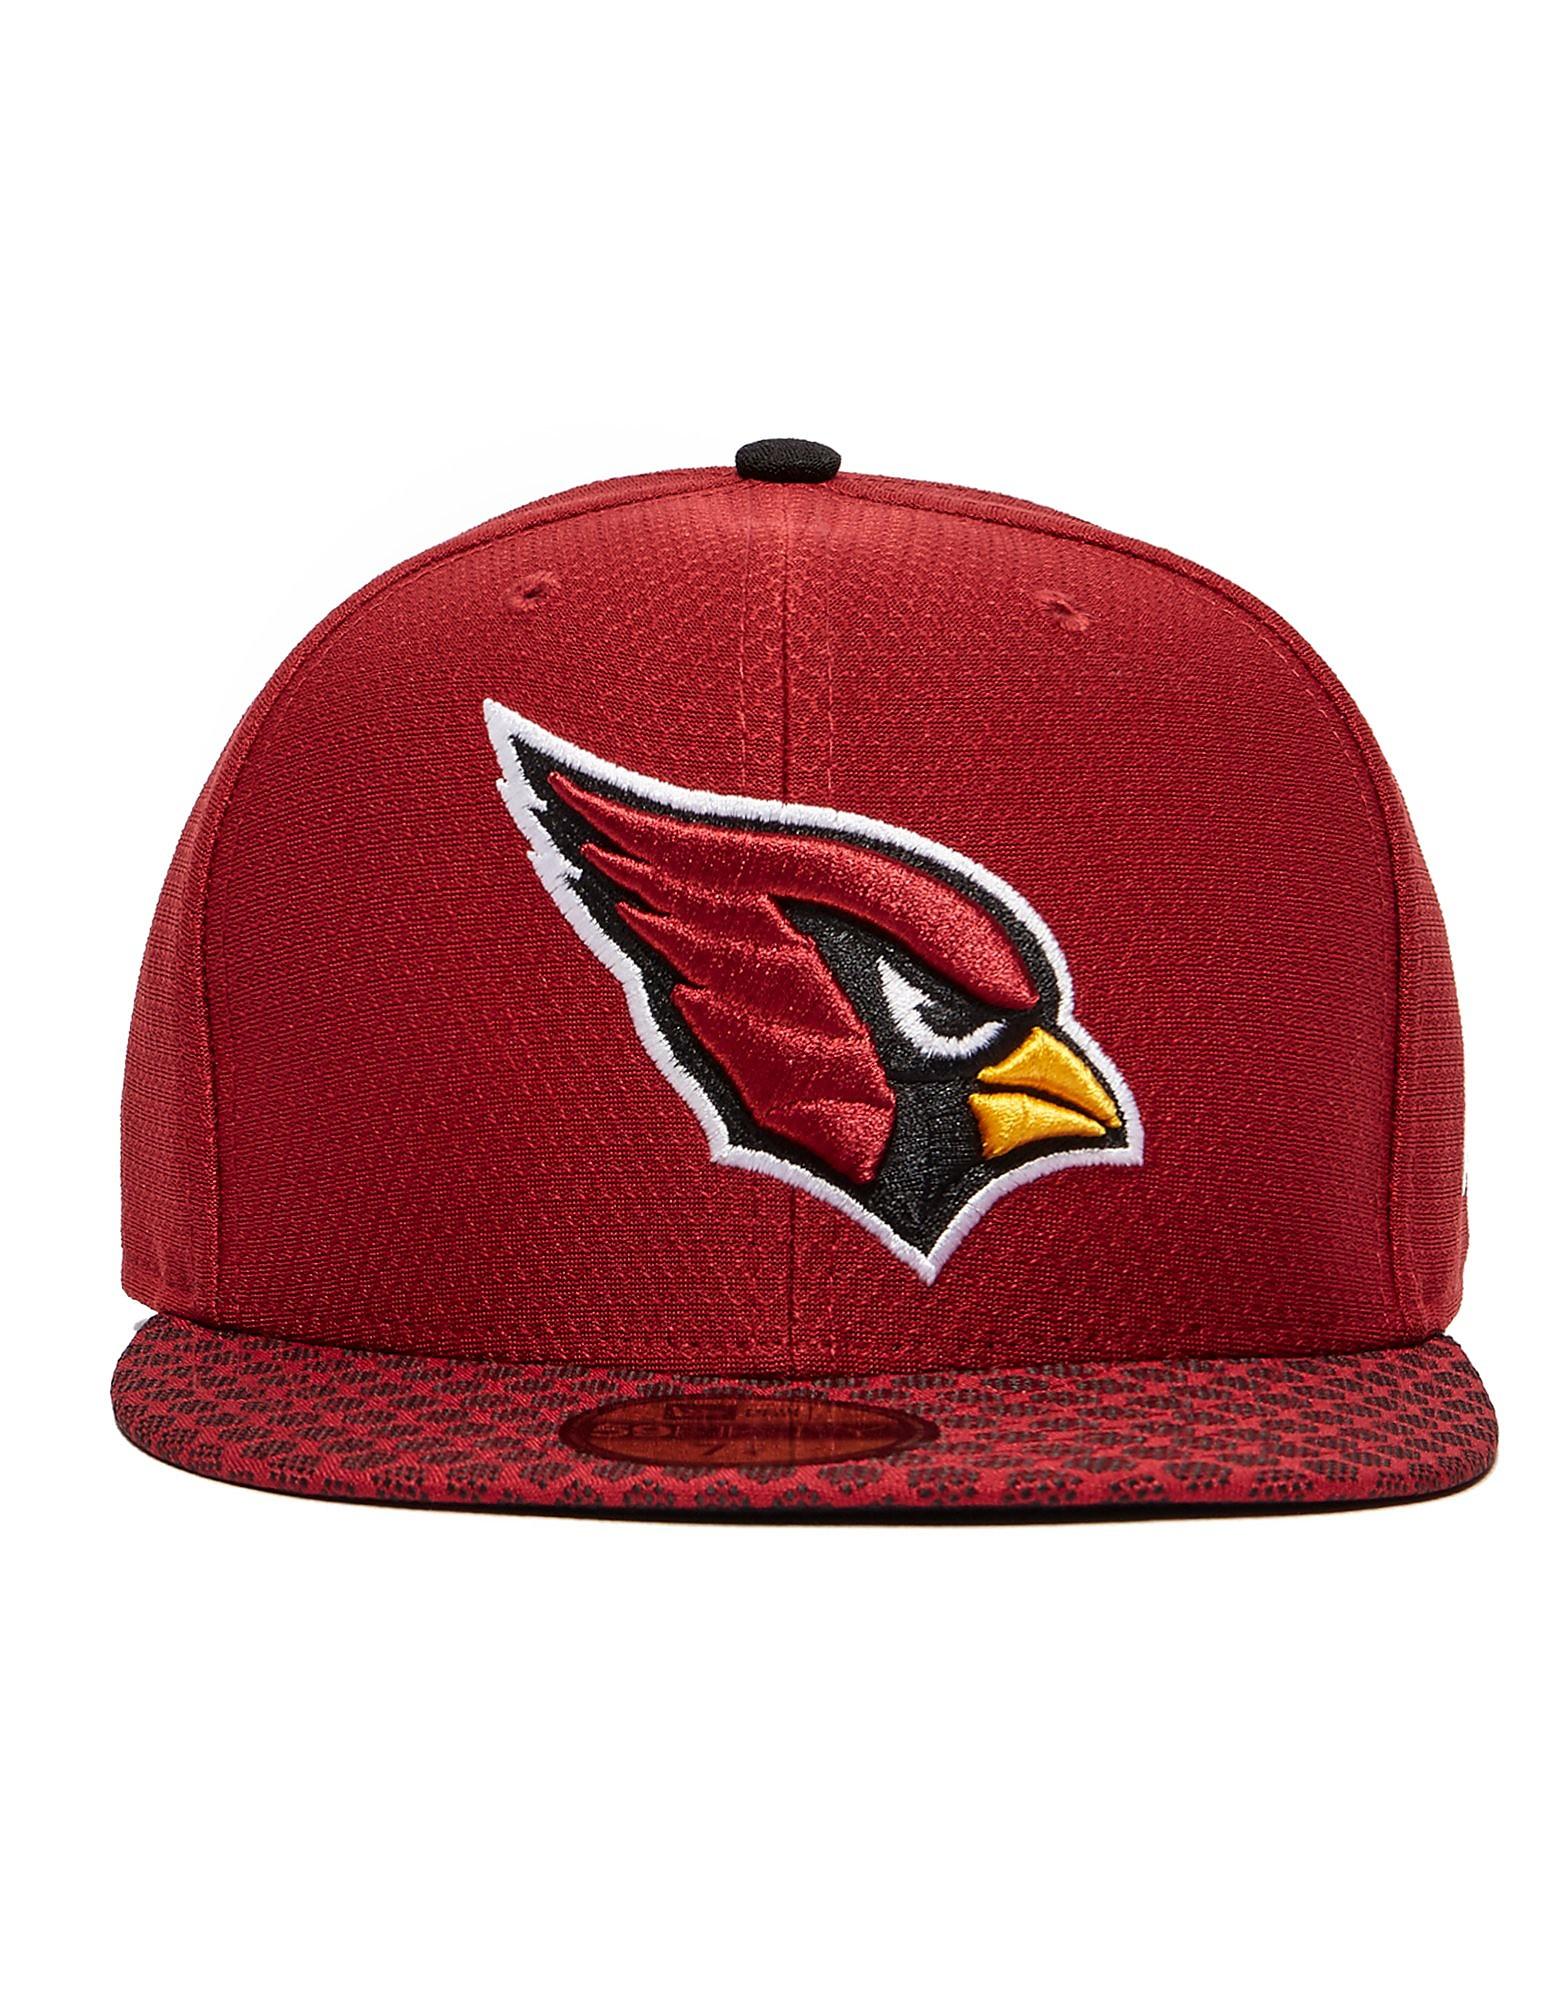 New Era Arizona Cardinals 59FIFTY Kappe